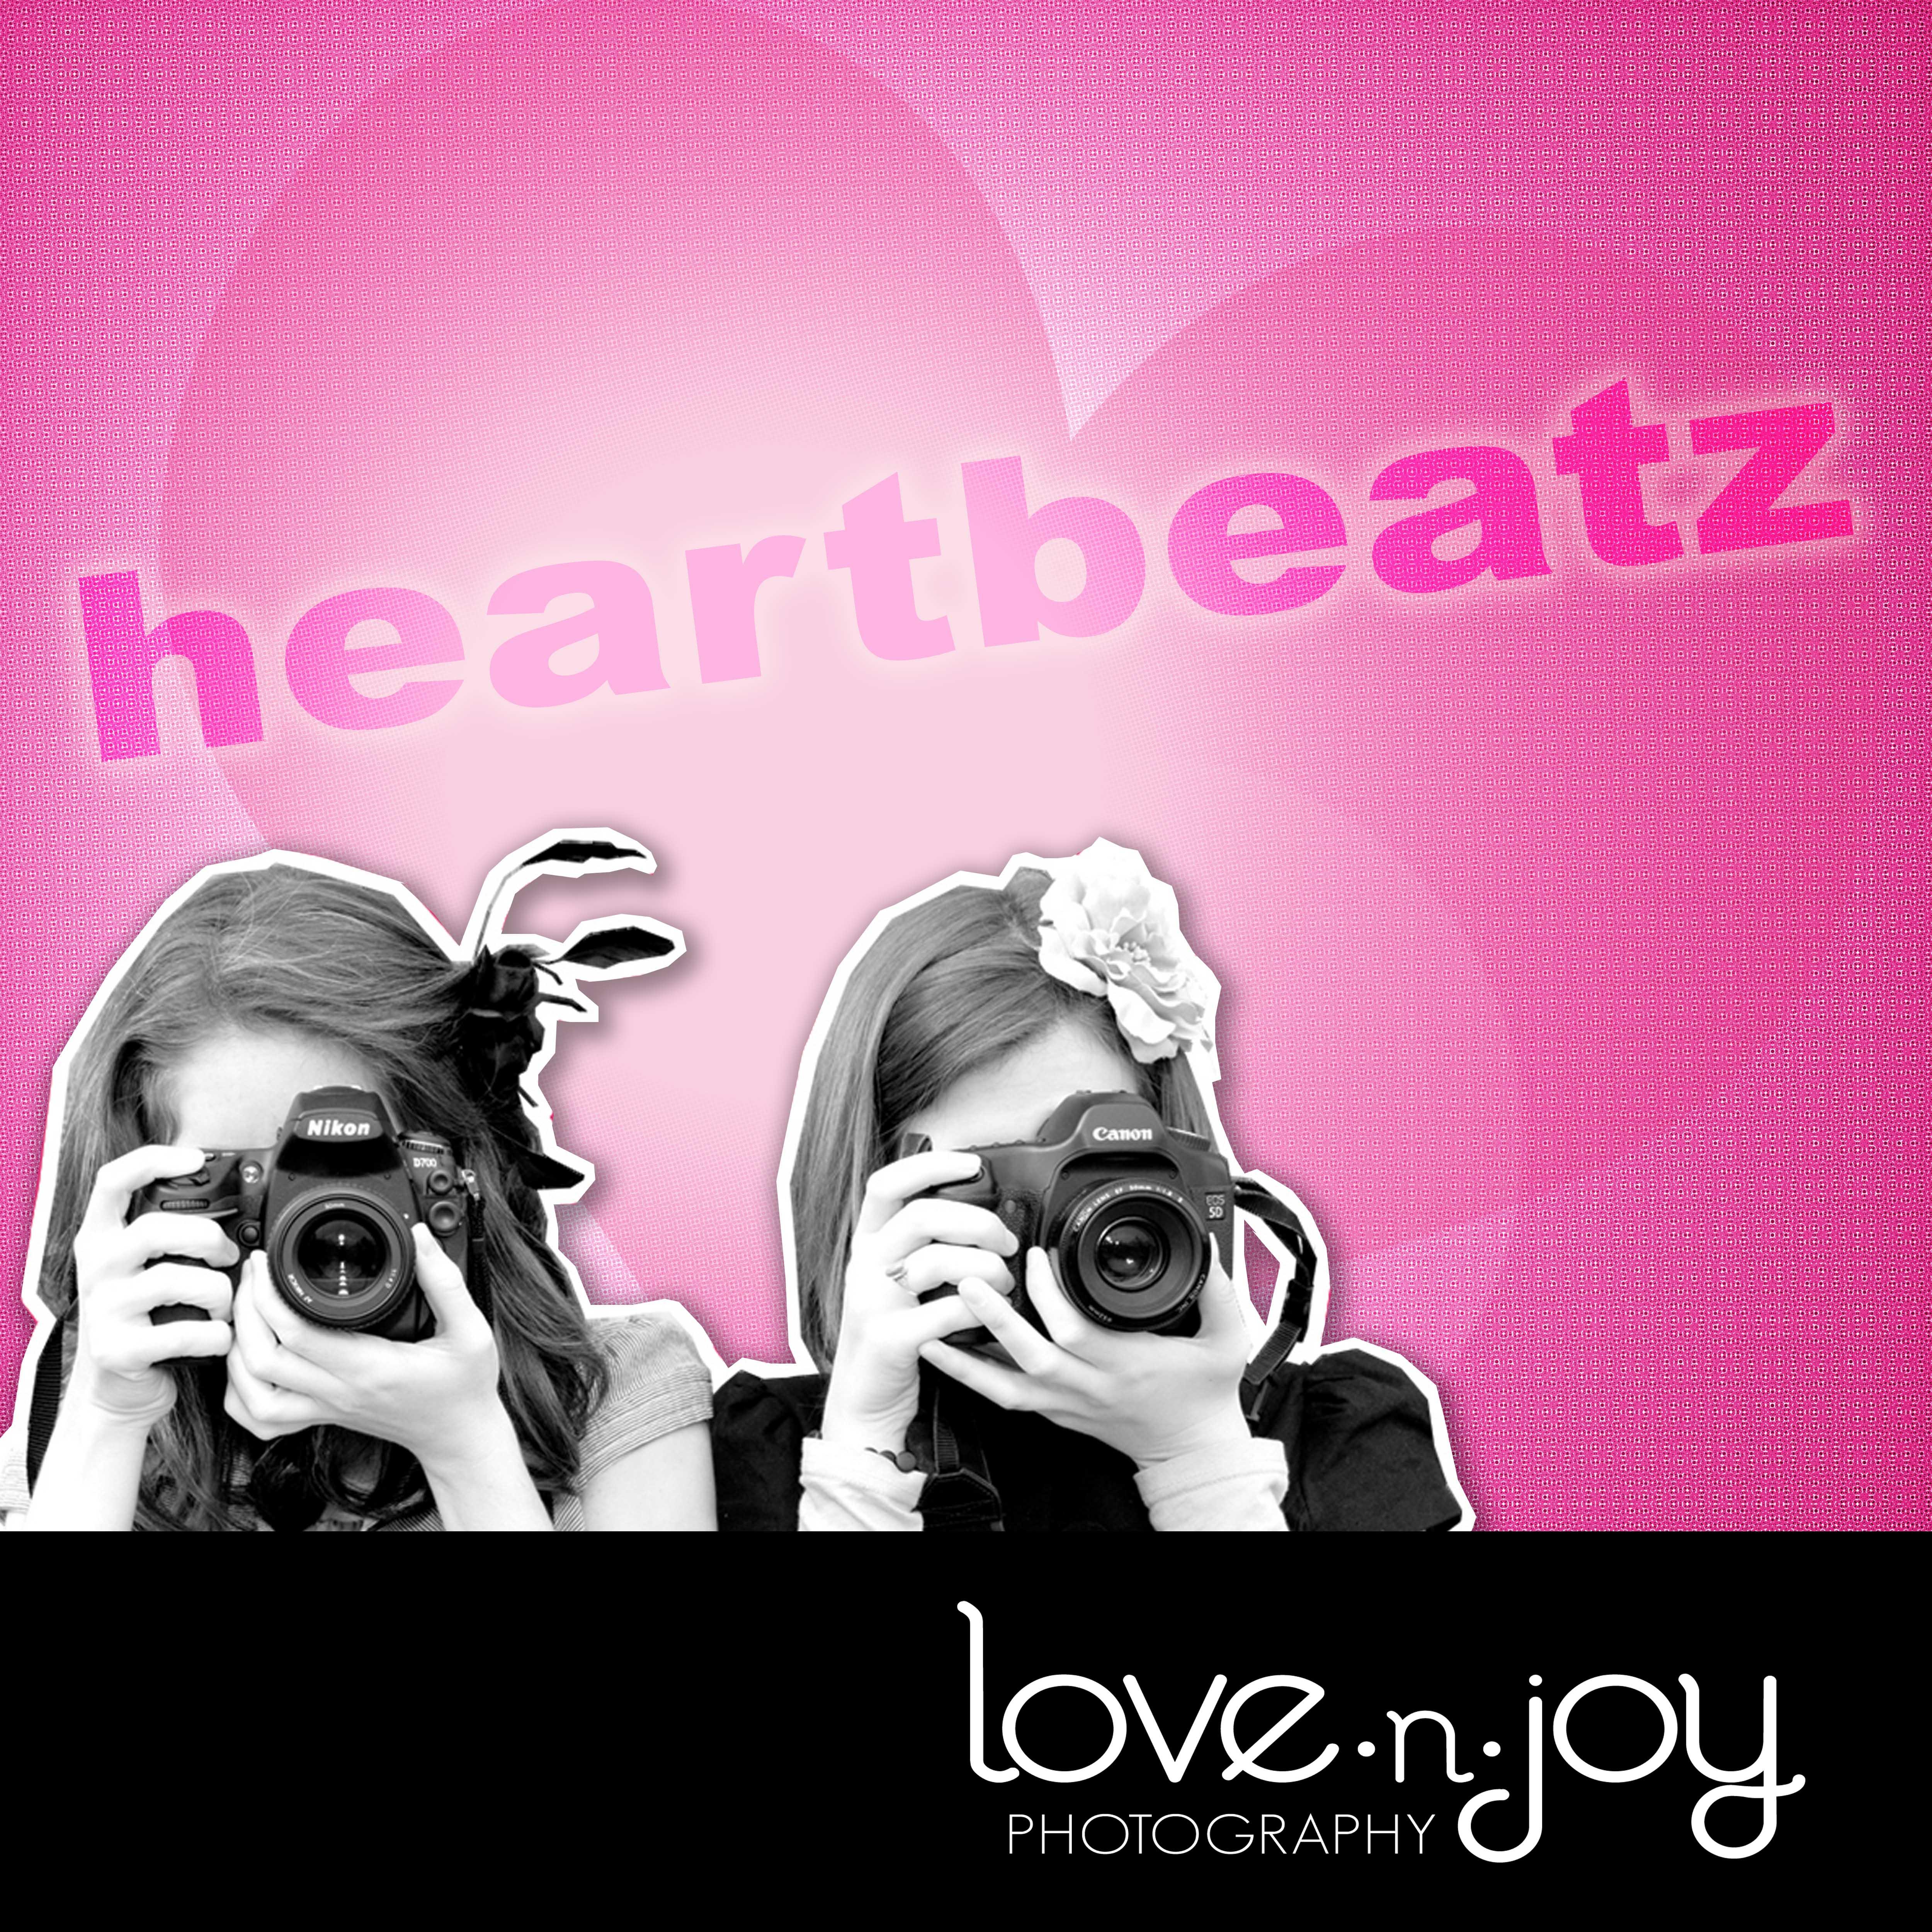 love n joy | HI-FI WEDDINGS - YOUR WEDDING, YOUR MUSIC